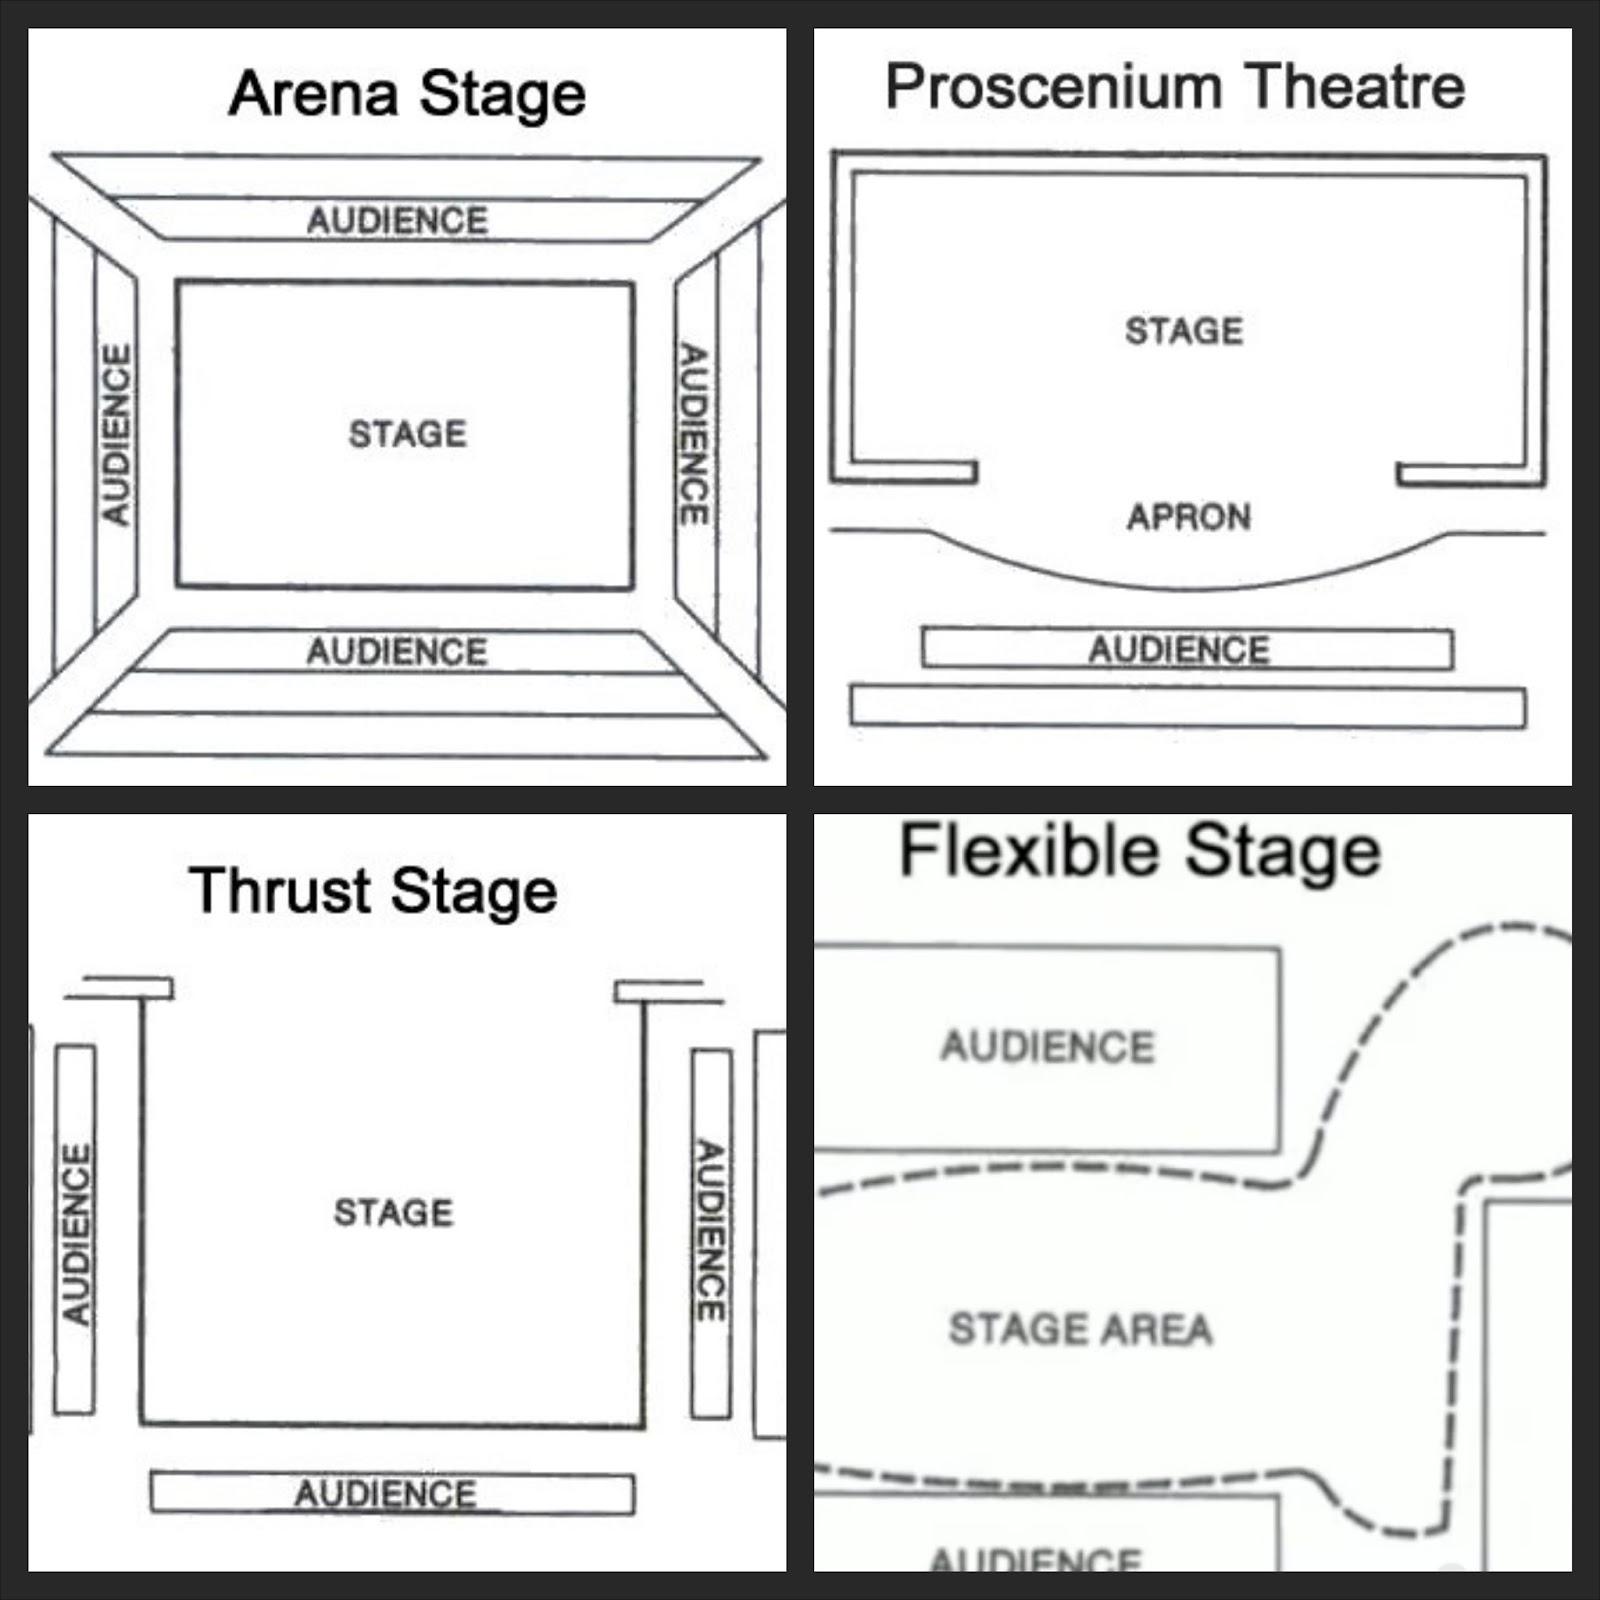 proscenium stage diagram box functional flow block visio velcro and glue guns tech art types